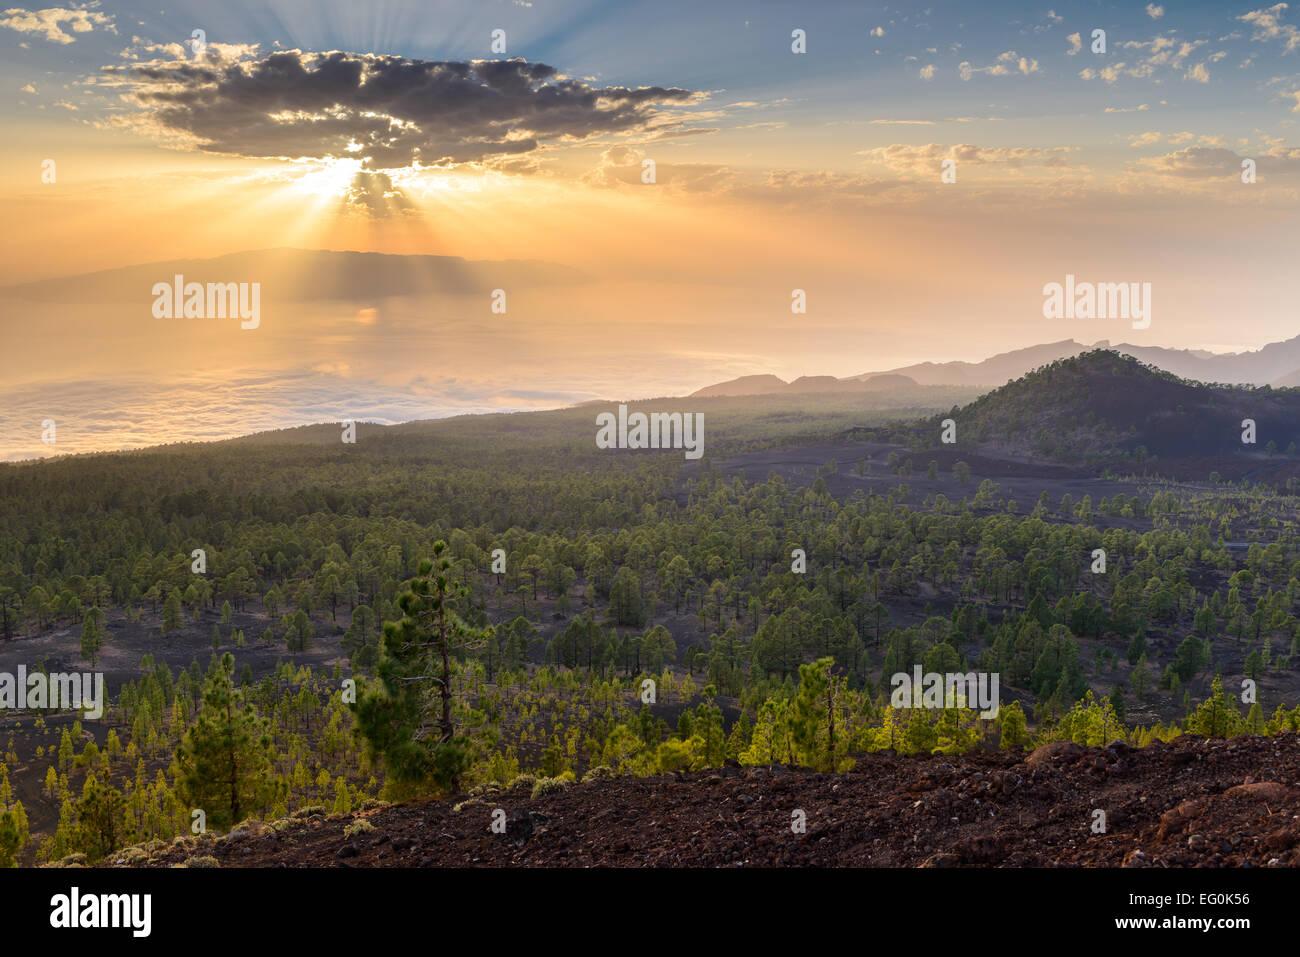 España, Islas Canarias, Tenerife, fascinante paisaje volcánico Imagen De Stock